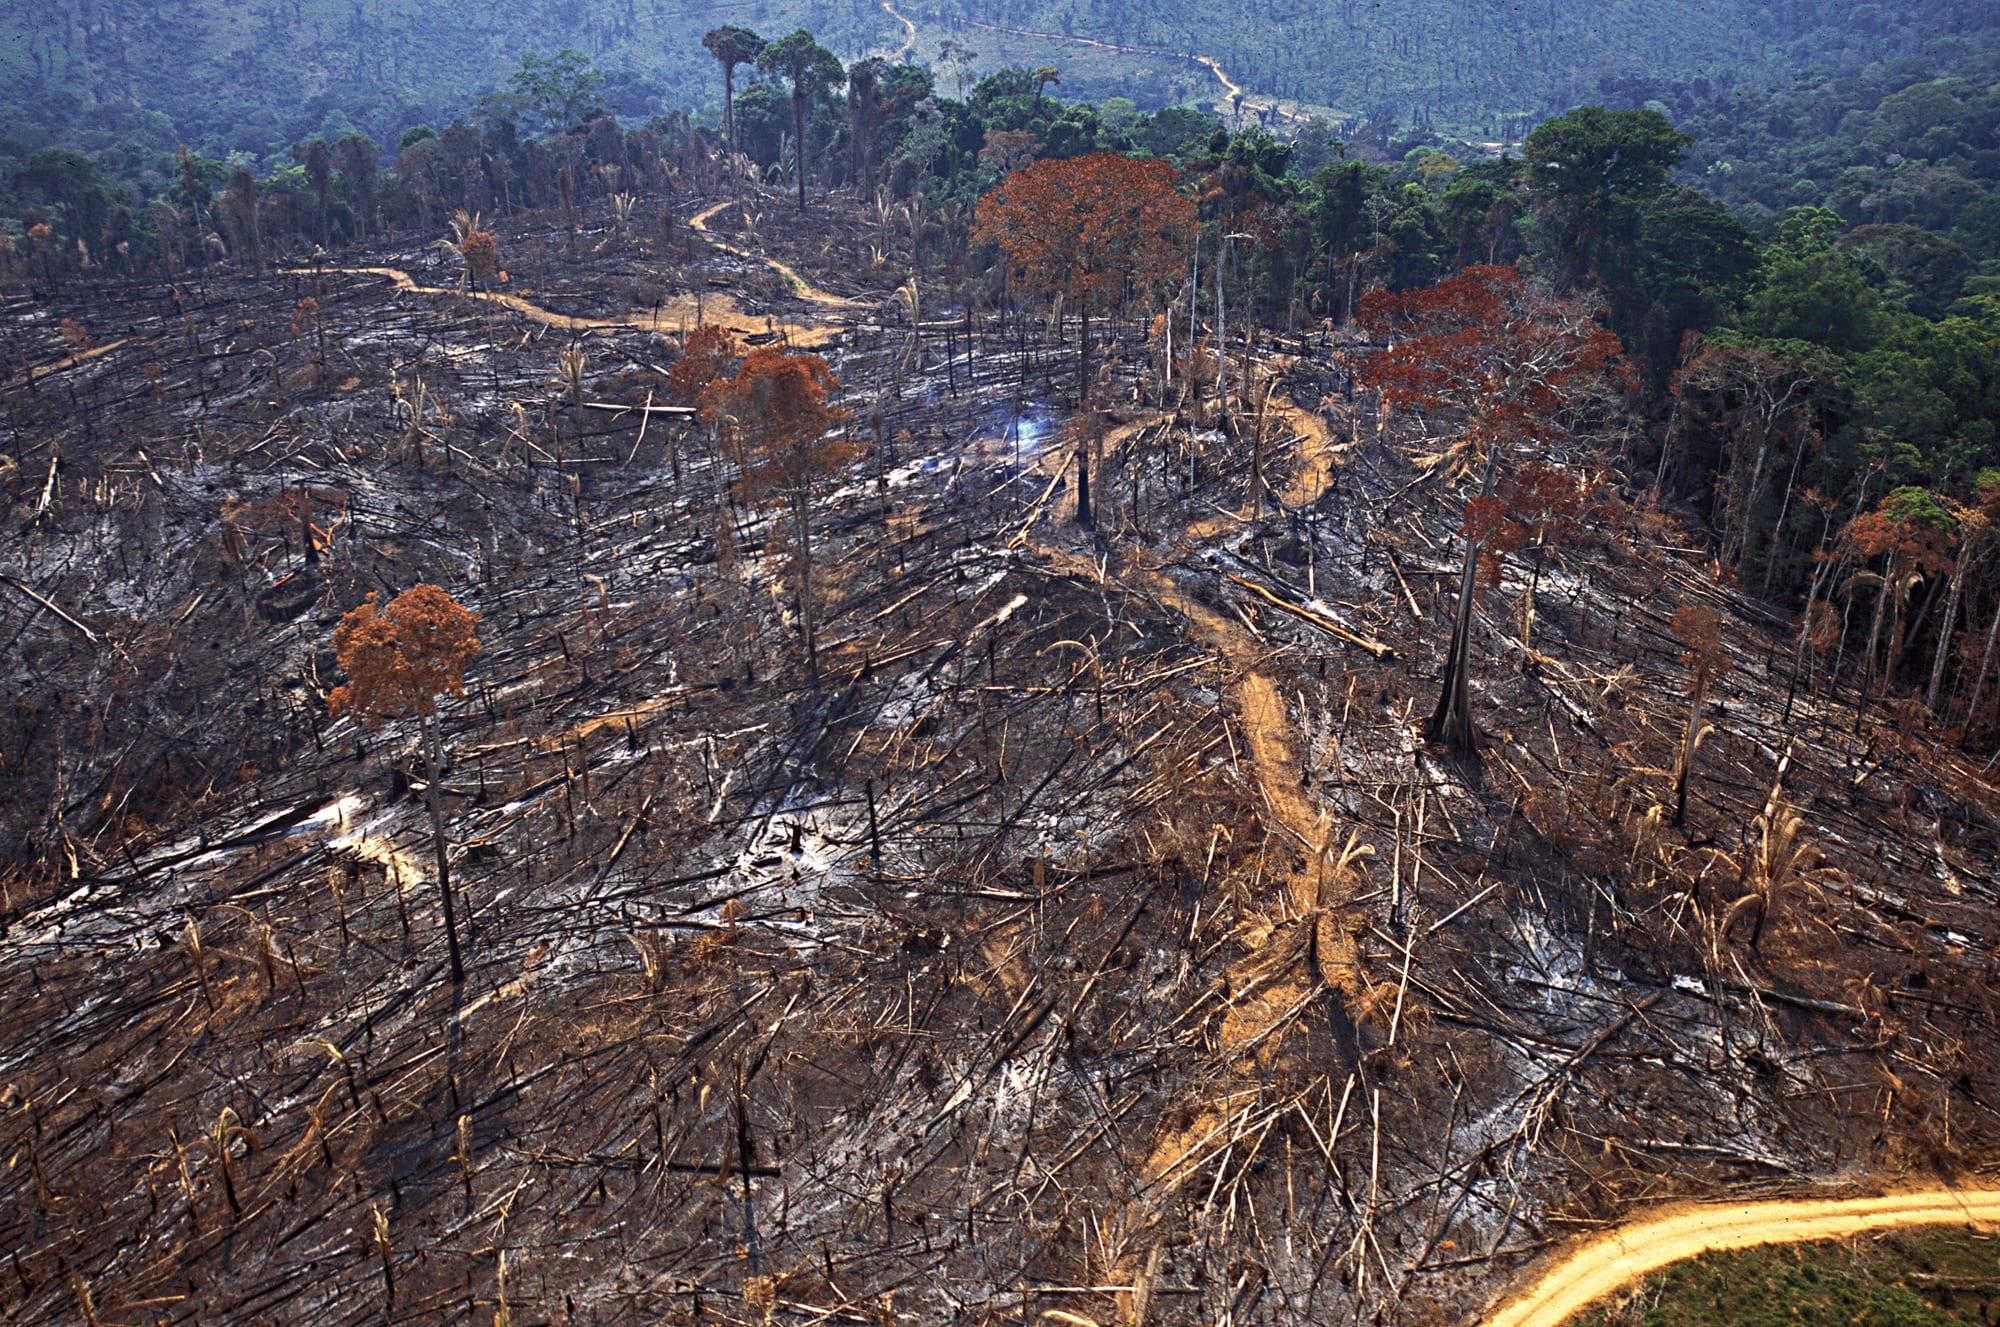 dev01157 Araquem de Alcantaram 1 - #ImazonInTheMedia: Bills before Brazil Congress slammed for rewarding Amazon land grabbers (Mongabay)